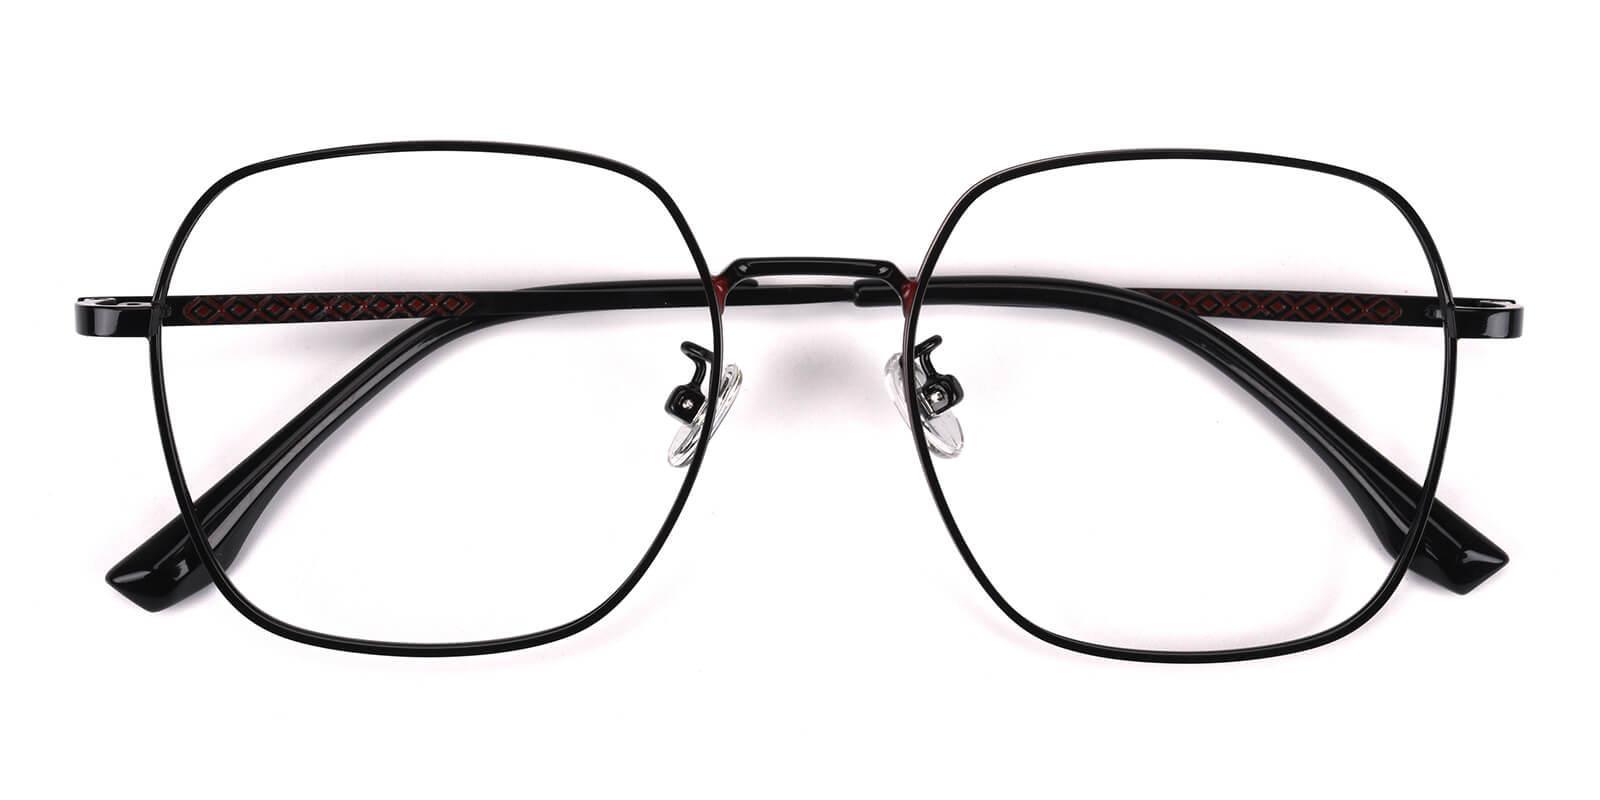 Vincoy-Black-Square-Metal-Eyeglasses-detail